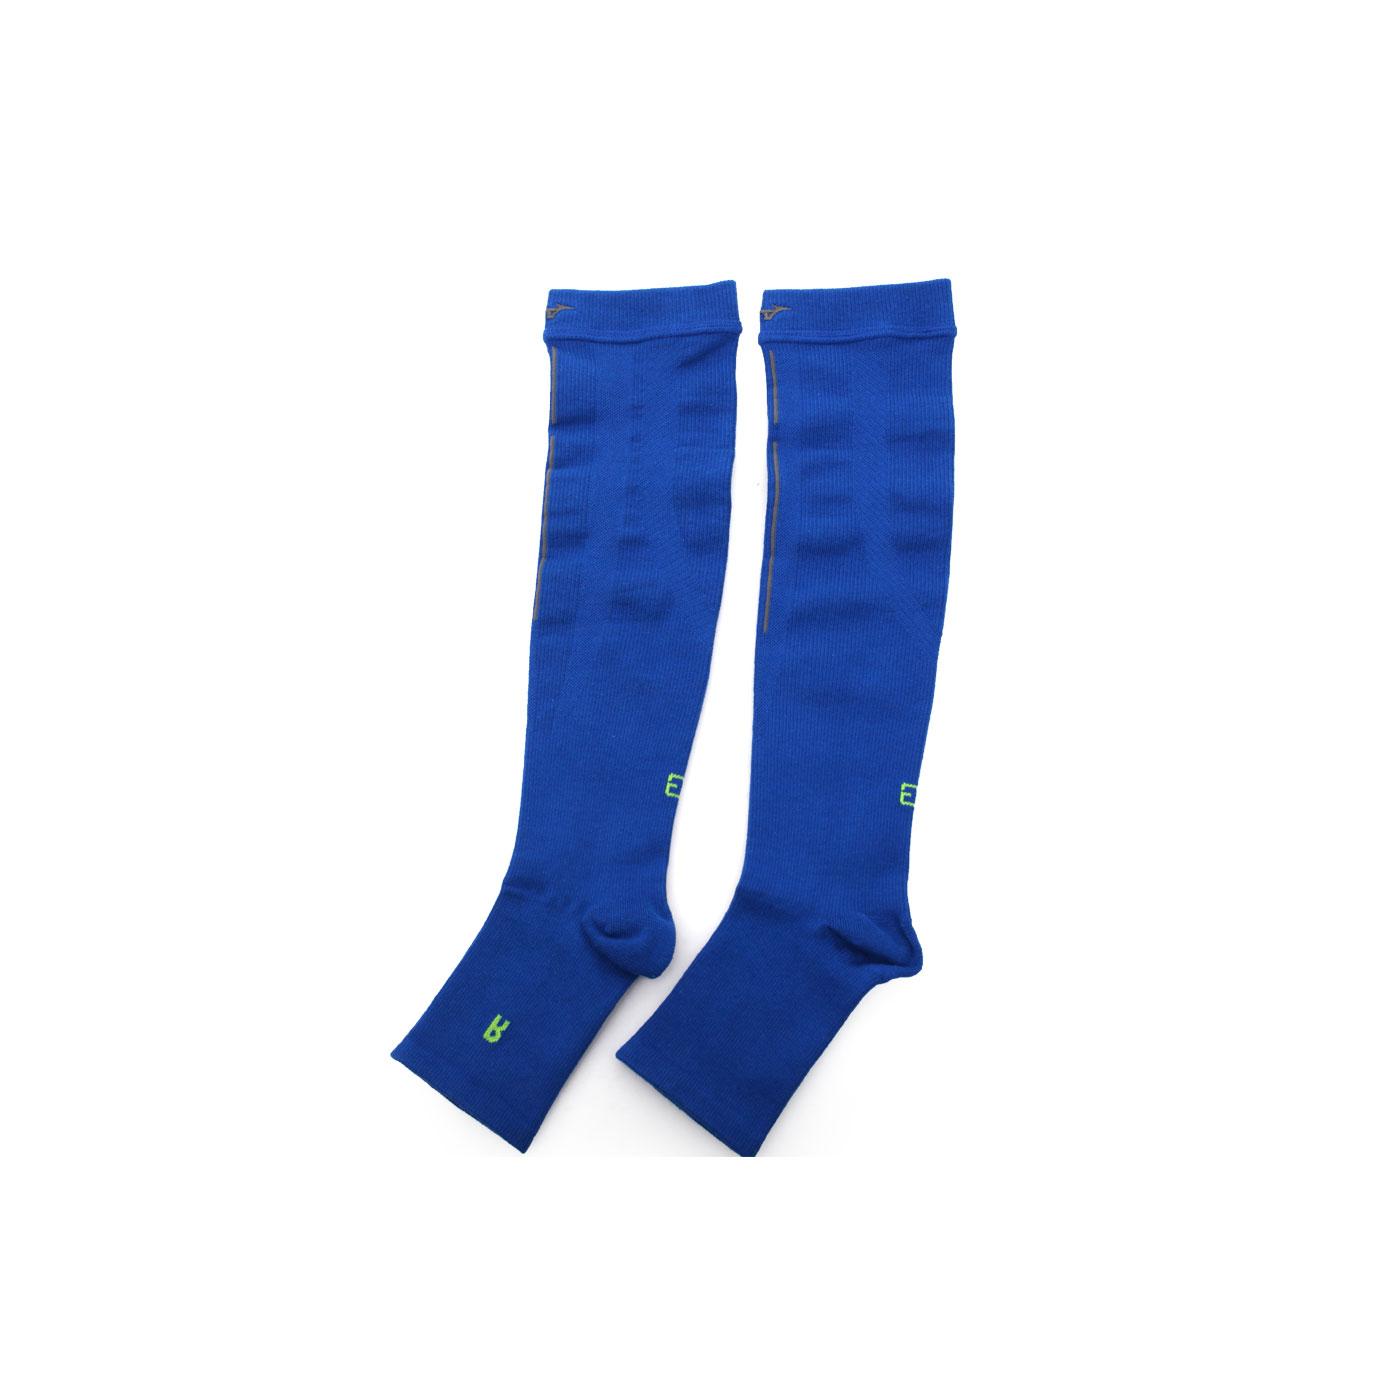 MIZUNO 日製-BG 襪套 K2JJ4A5009 - 藍